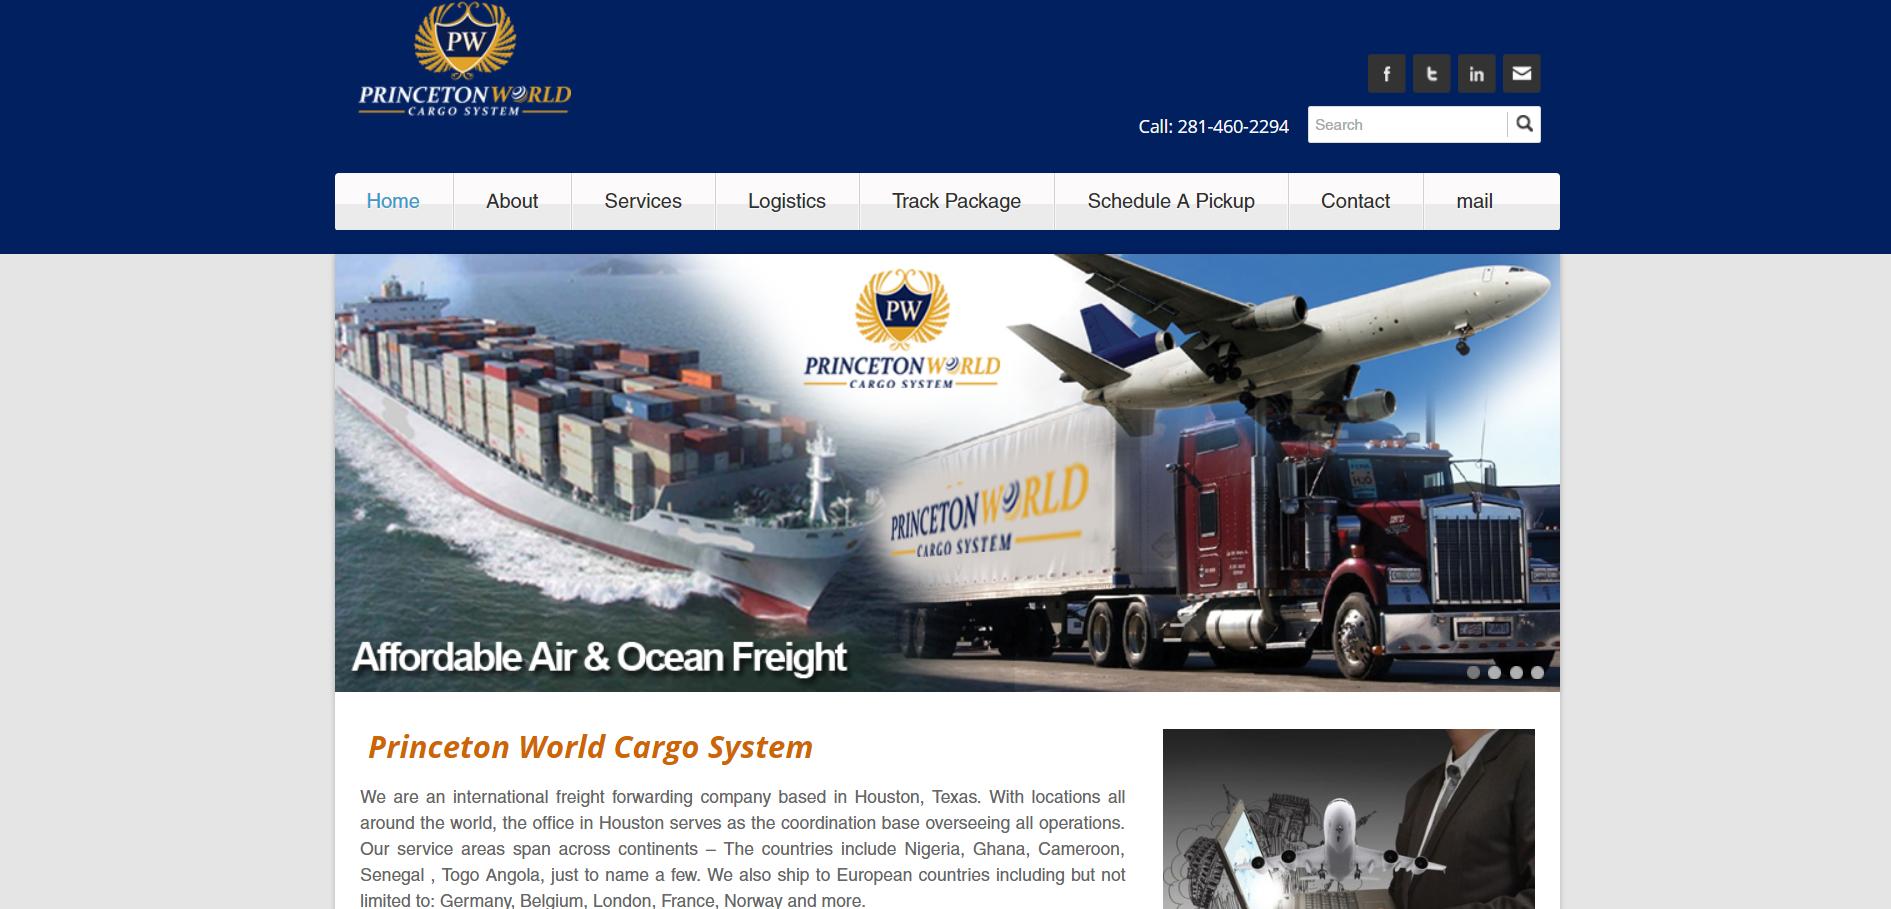 Princeton World Cargo